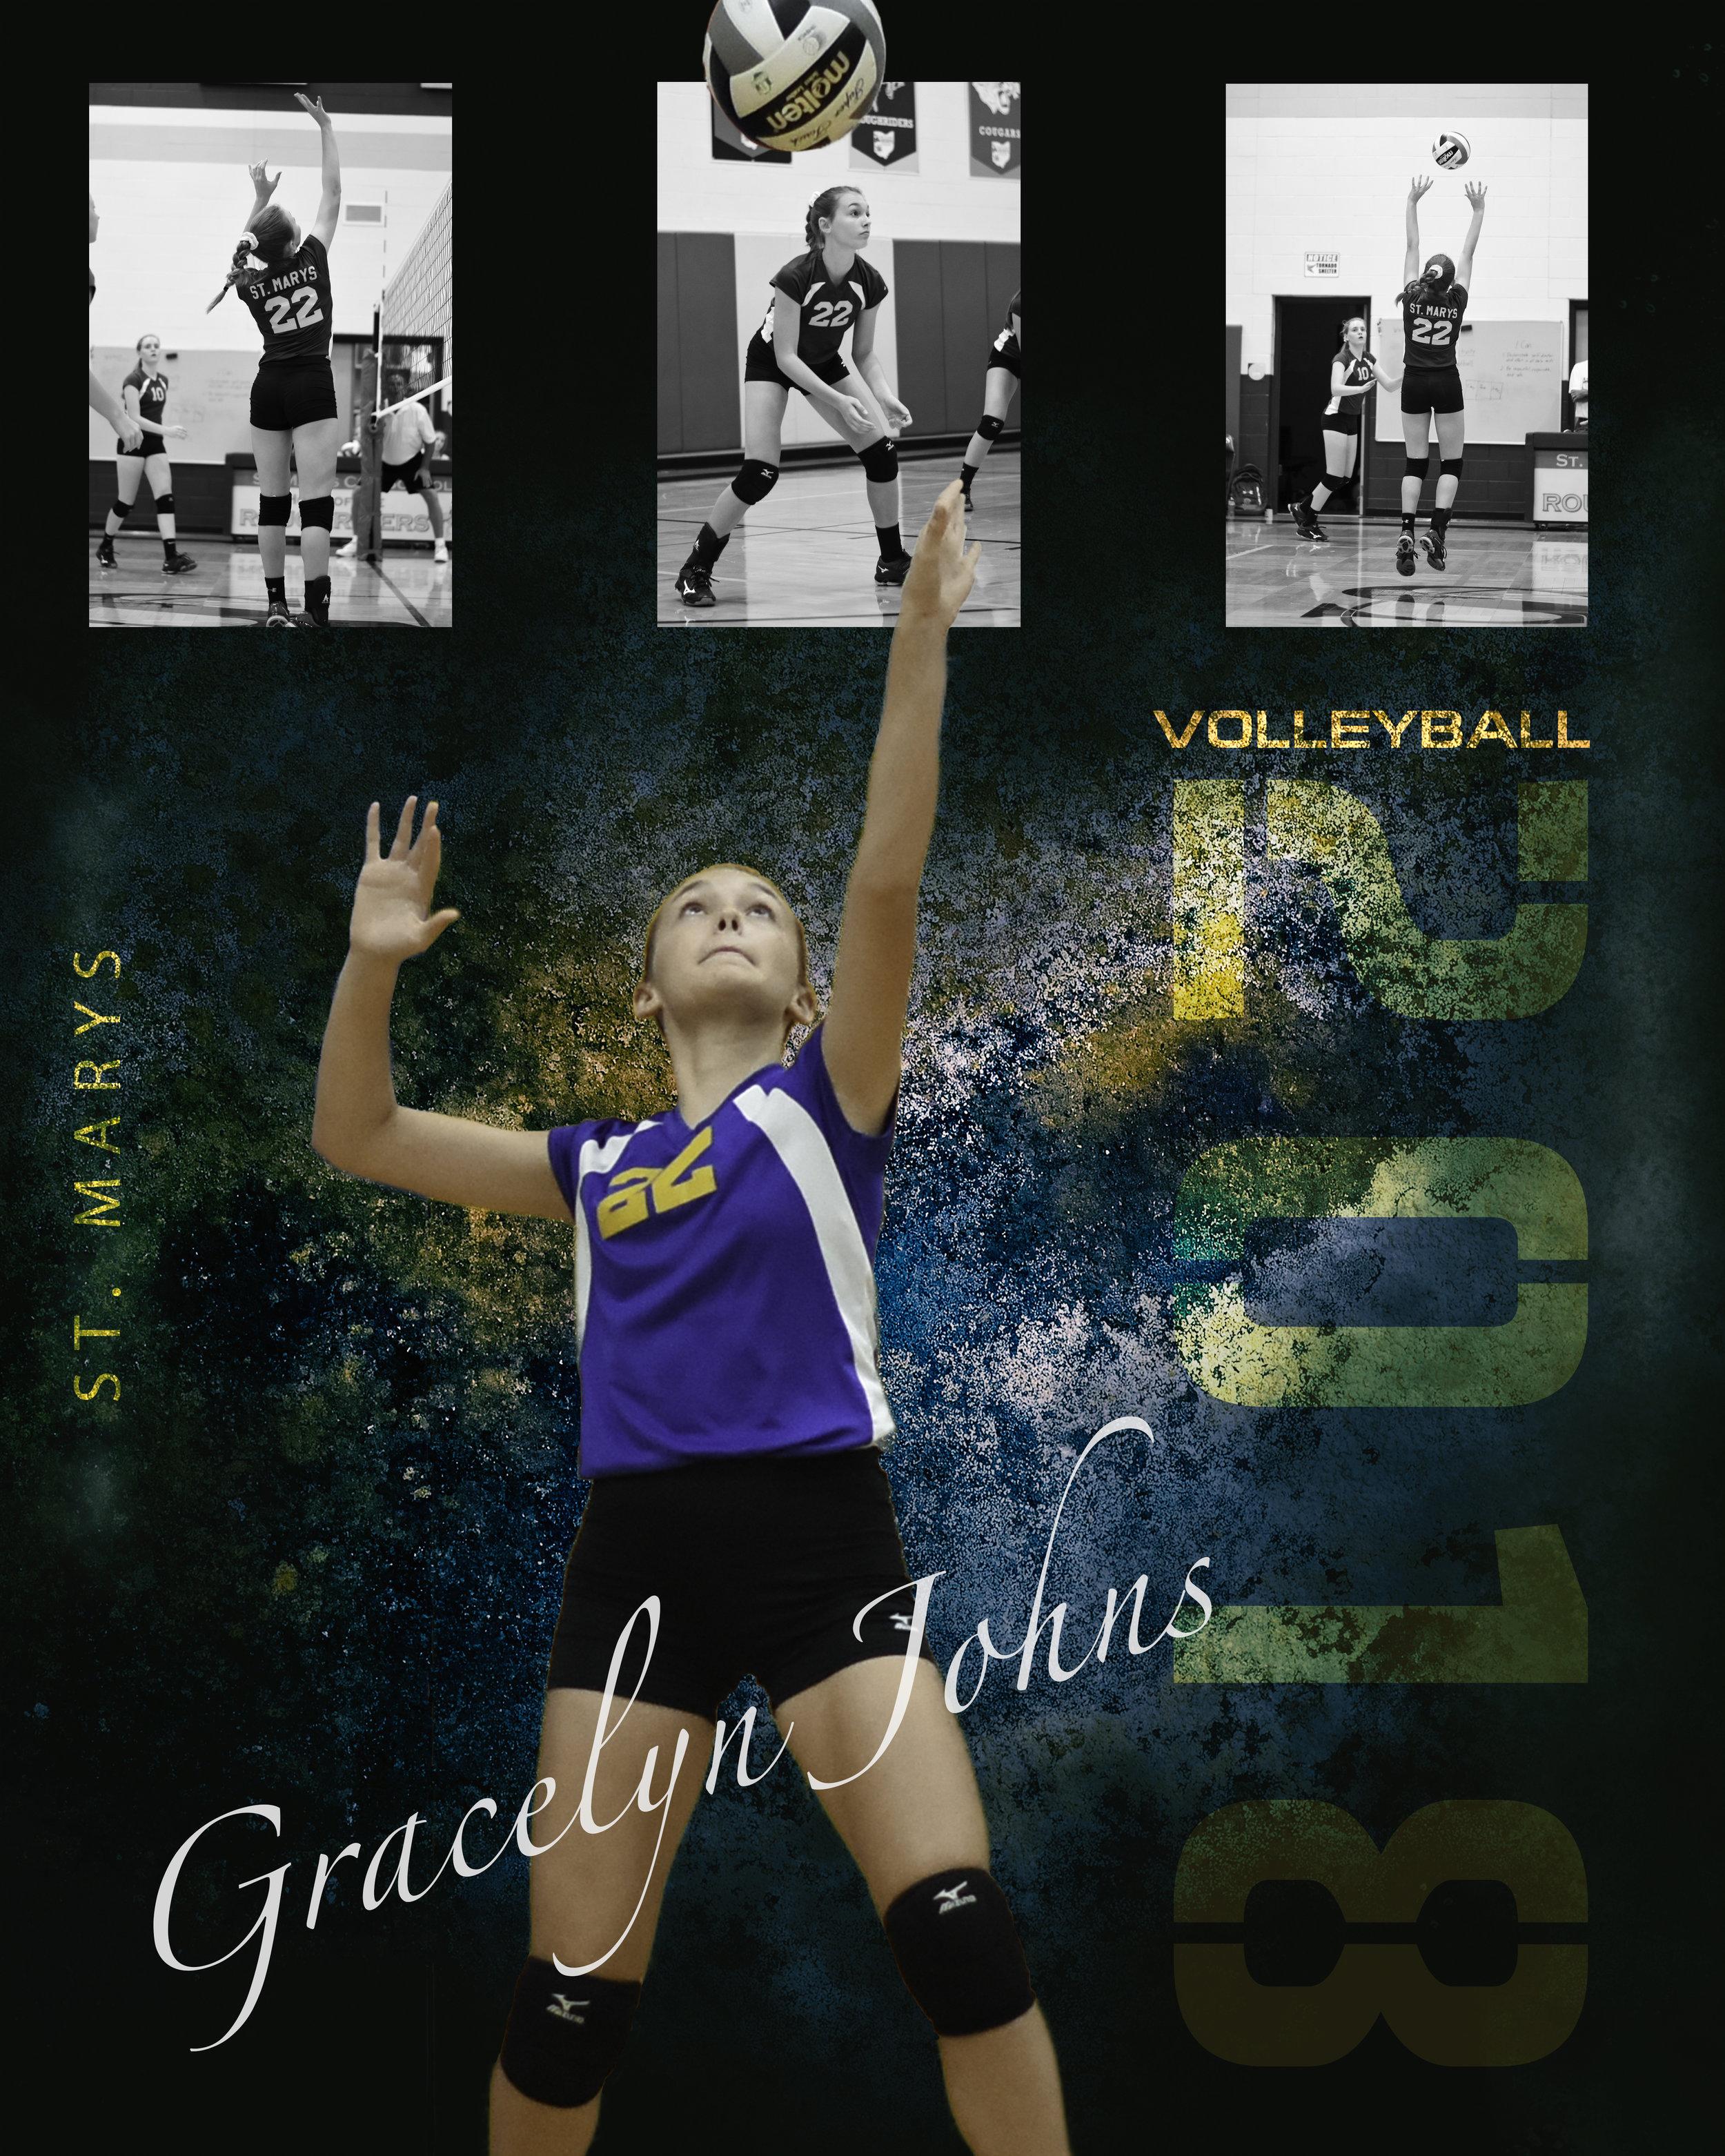 GracelynnJohns-VOLLEYBALL-16X20.jpg